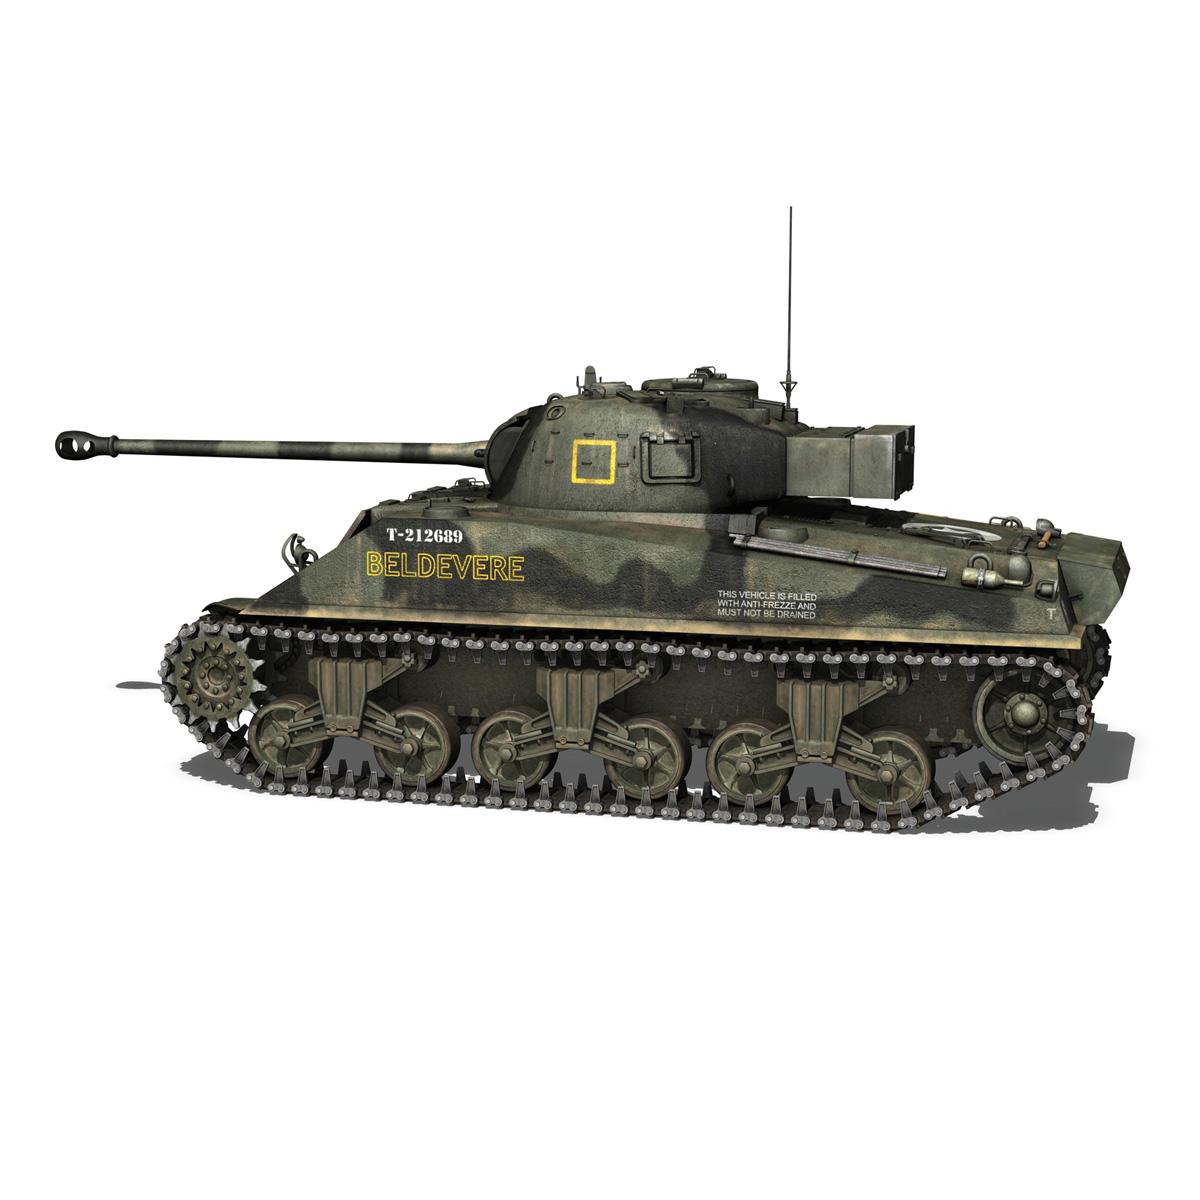 Sherman MK VC Firefly - Beldevere 3d model  266014